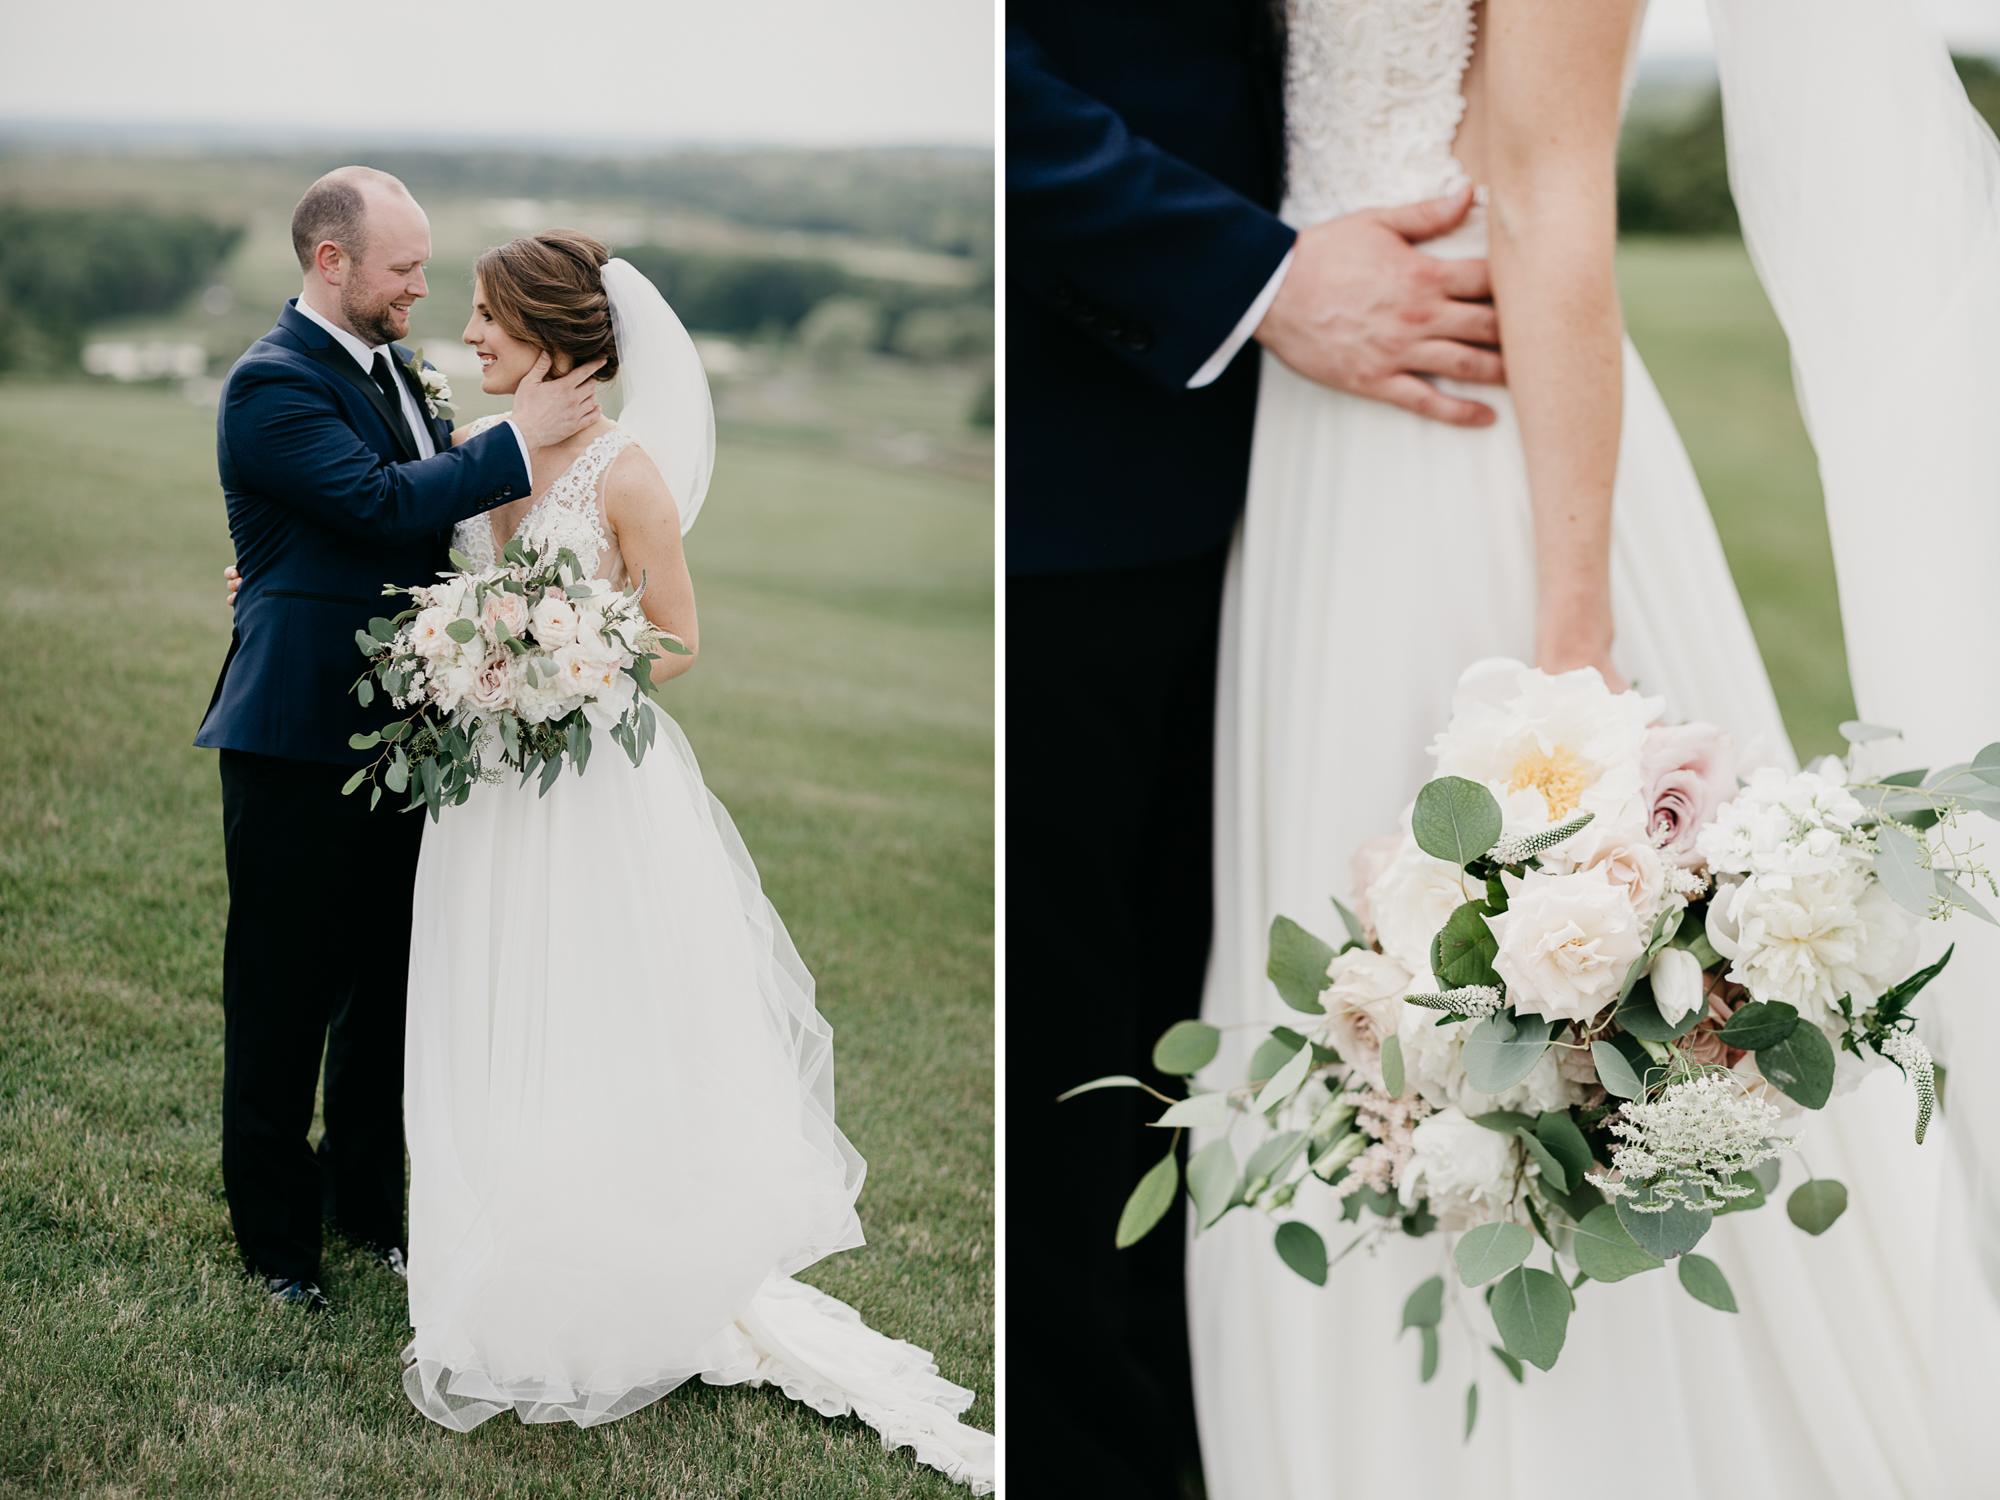 Jaclyn_Andrew_quincy_massachusetts_wedding008.jpg